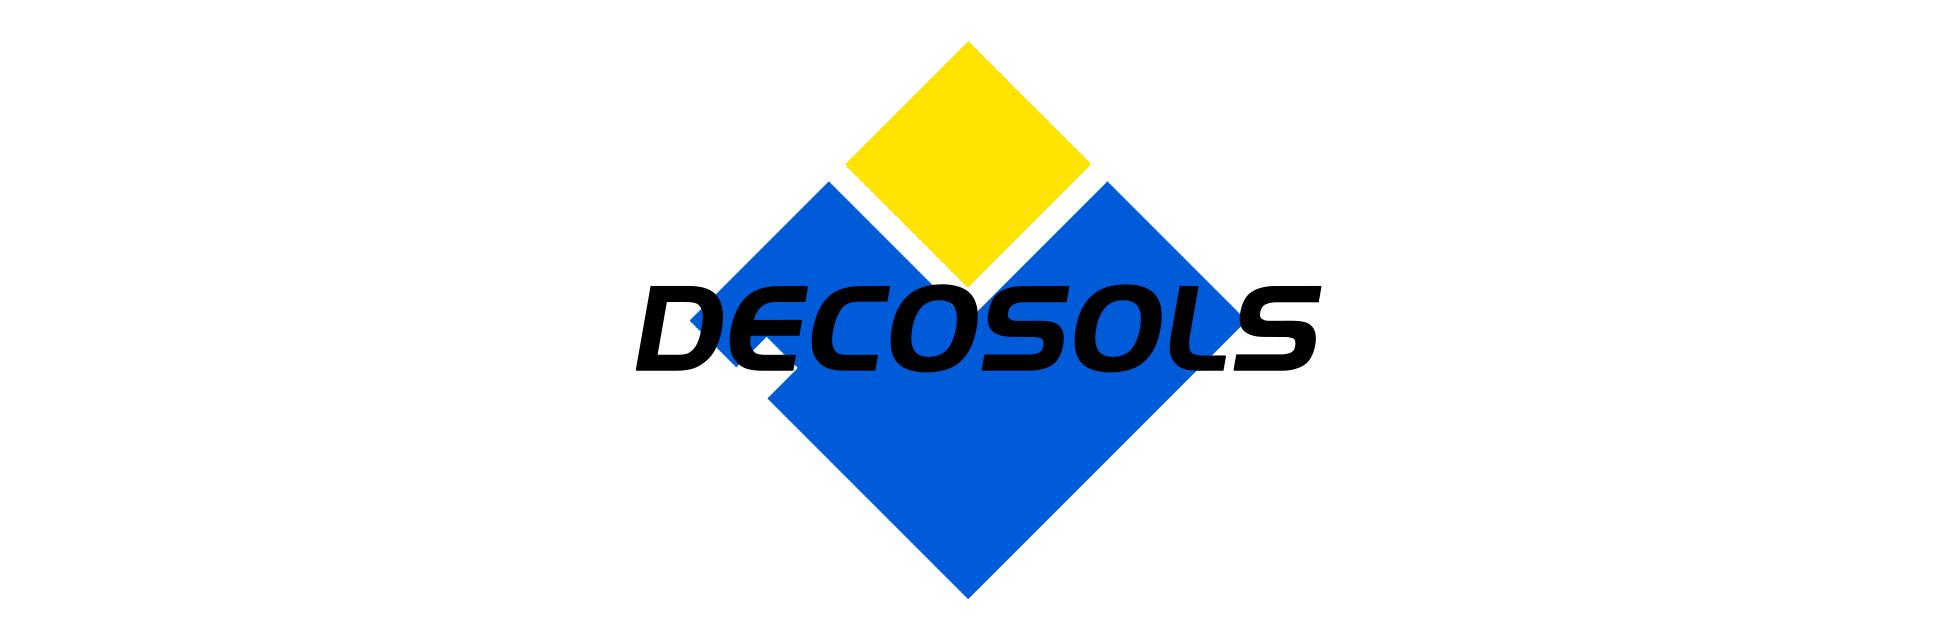 bandeau_decosols